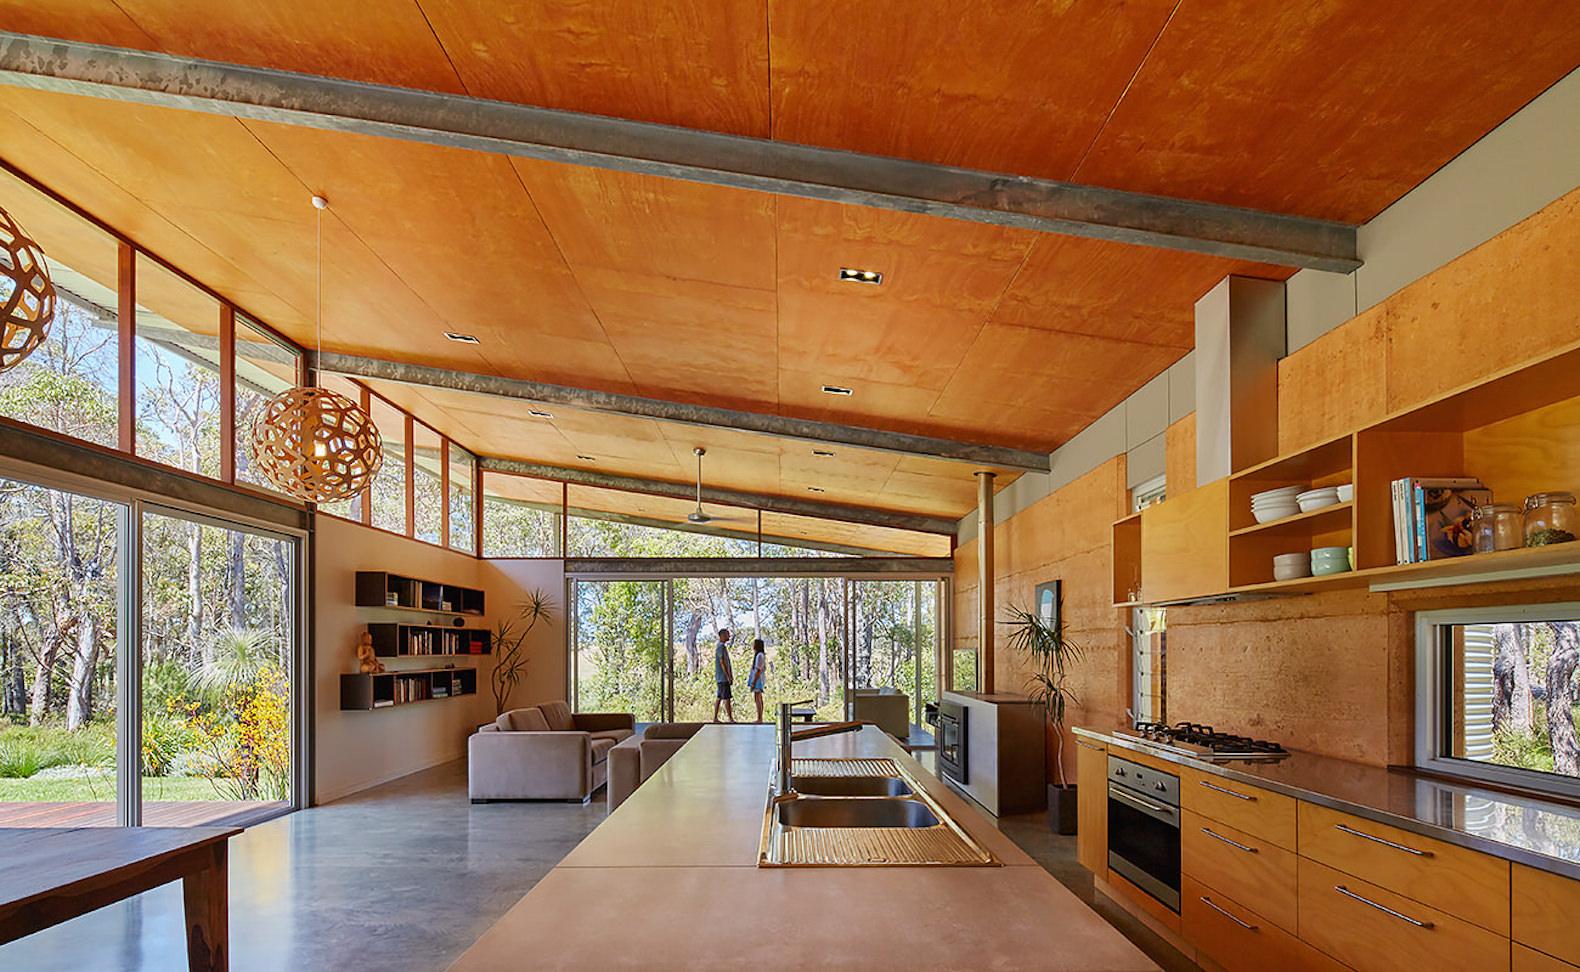 Fullsize Of Eco Wood Treatment